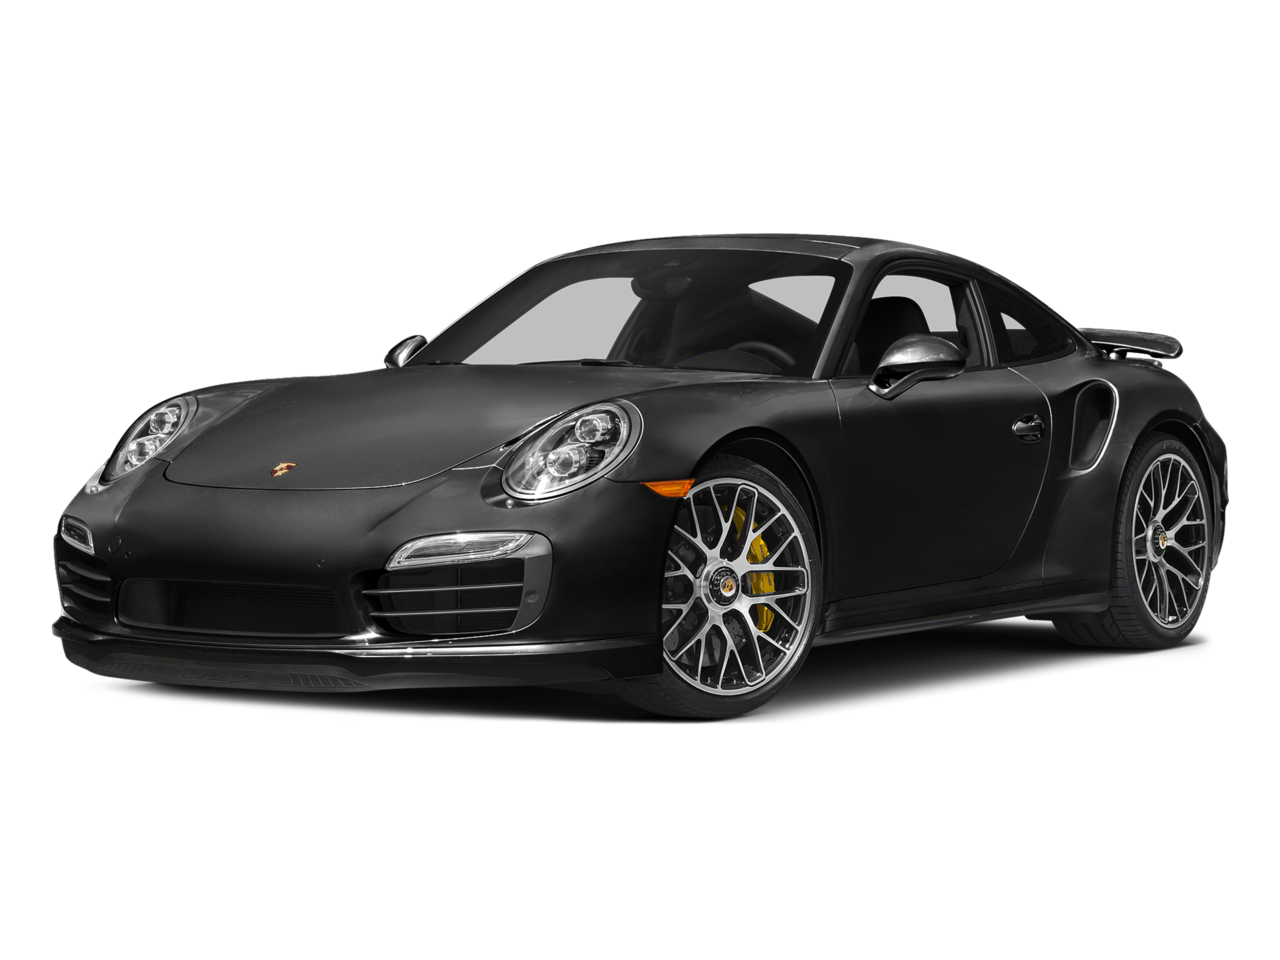 2016 porsche 911 turbo s los angeles porsche dealer. Black Bedroom Furniture Sets. Home Design Ideas